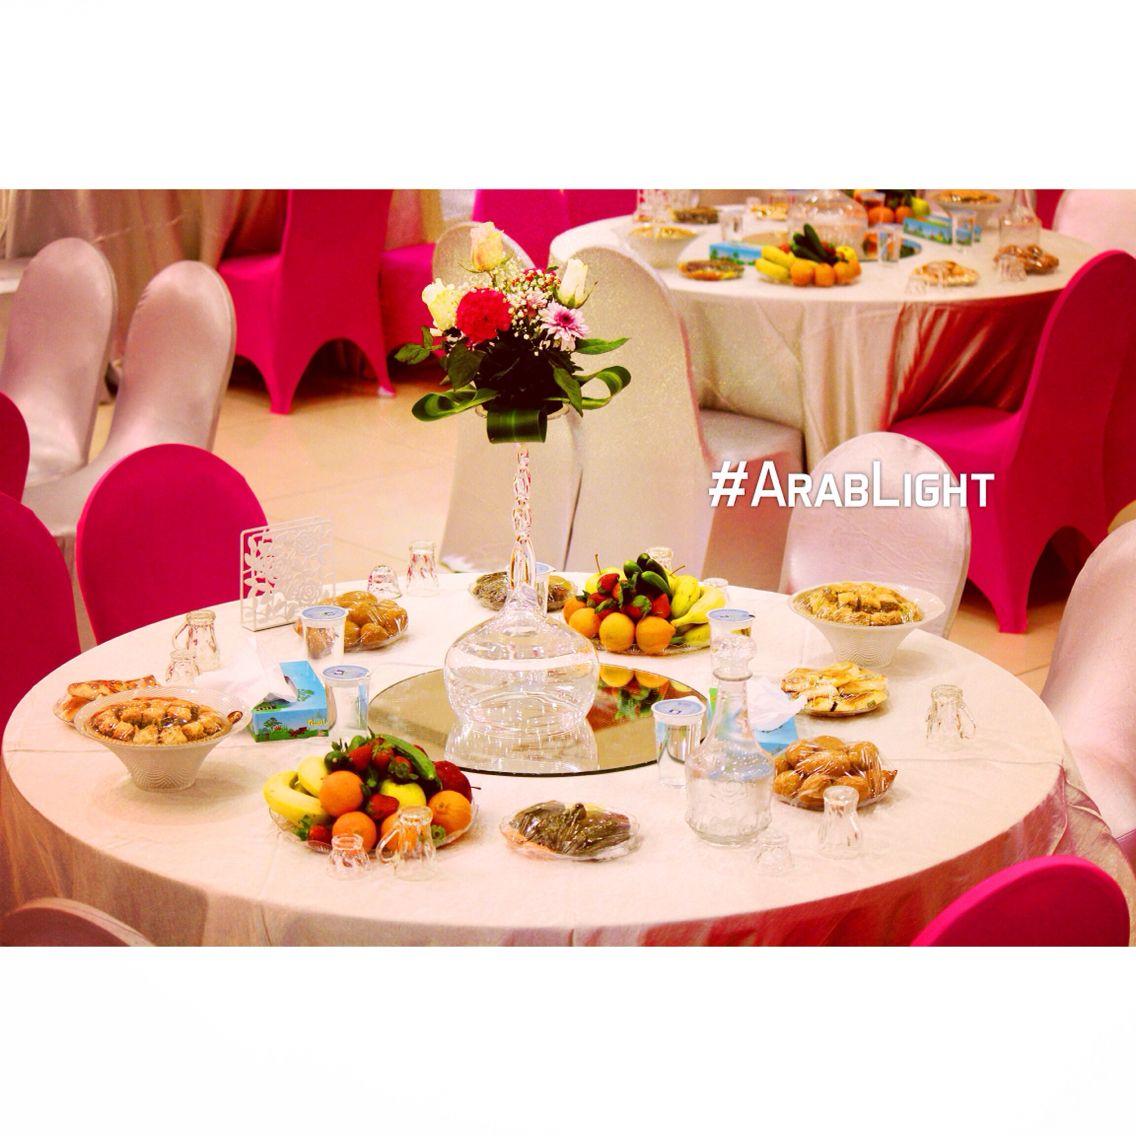 Event Party Wedding ابداع اراب لايت حفلات طاولات مناسبات مؤتمرات معارض كوشات مون لايت ليزر كوش 2015 تنسيق و Table Decorations Decor Home Decor